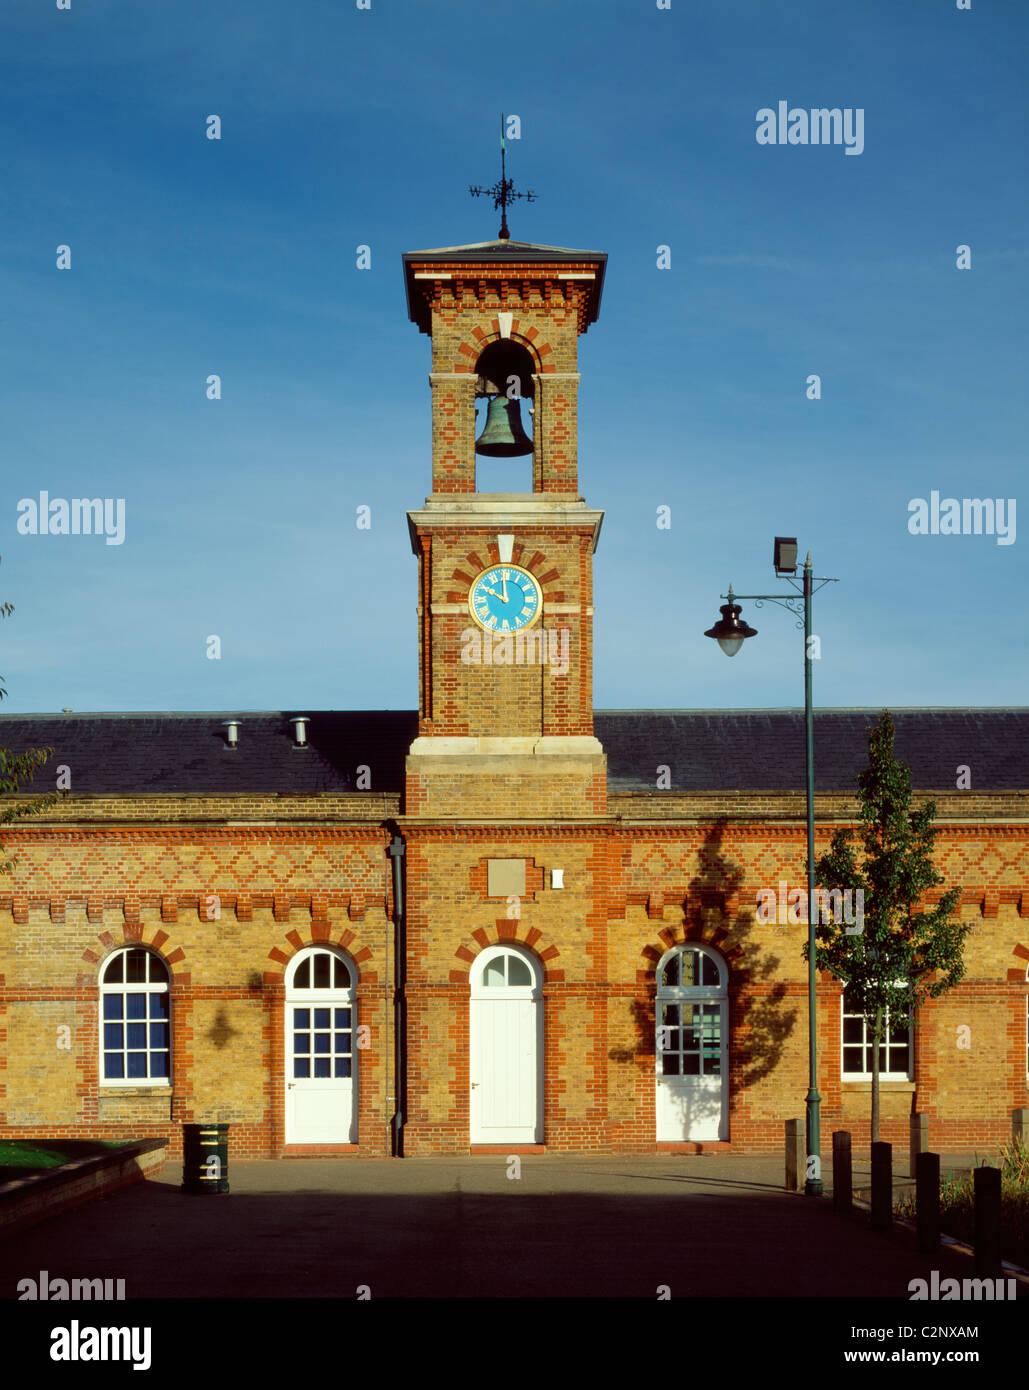 RSA IV Enfield, London. Clock Tower. - Stock Image